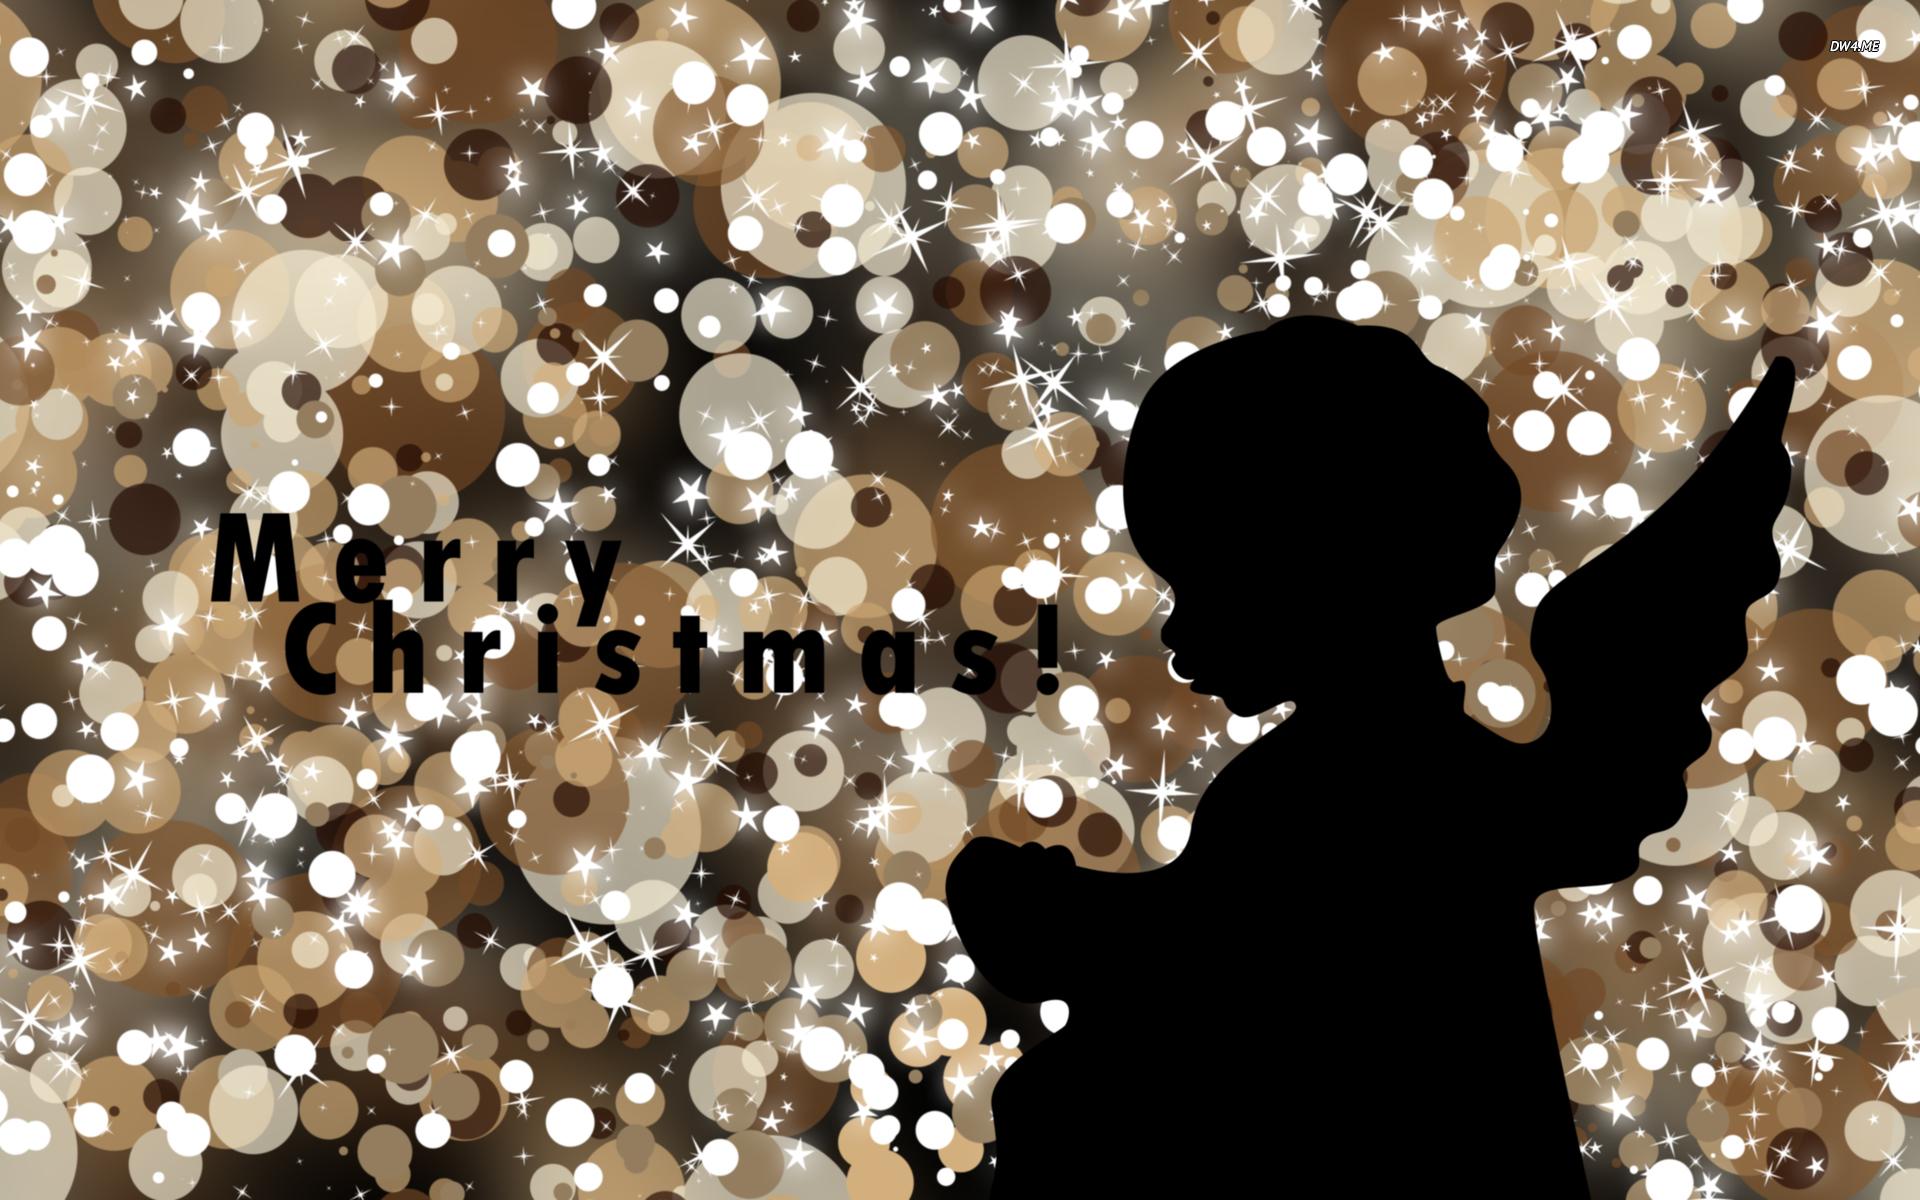 Christmas angel silhouette wallpaper 2560x1600 Christmas angel 1920x1200